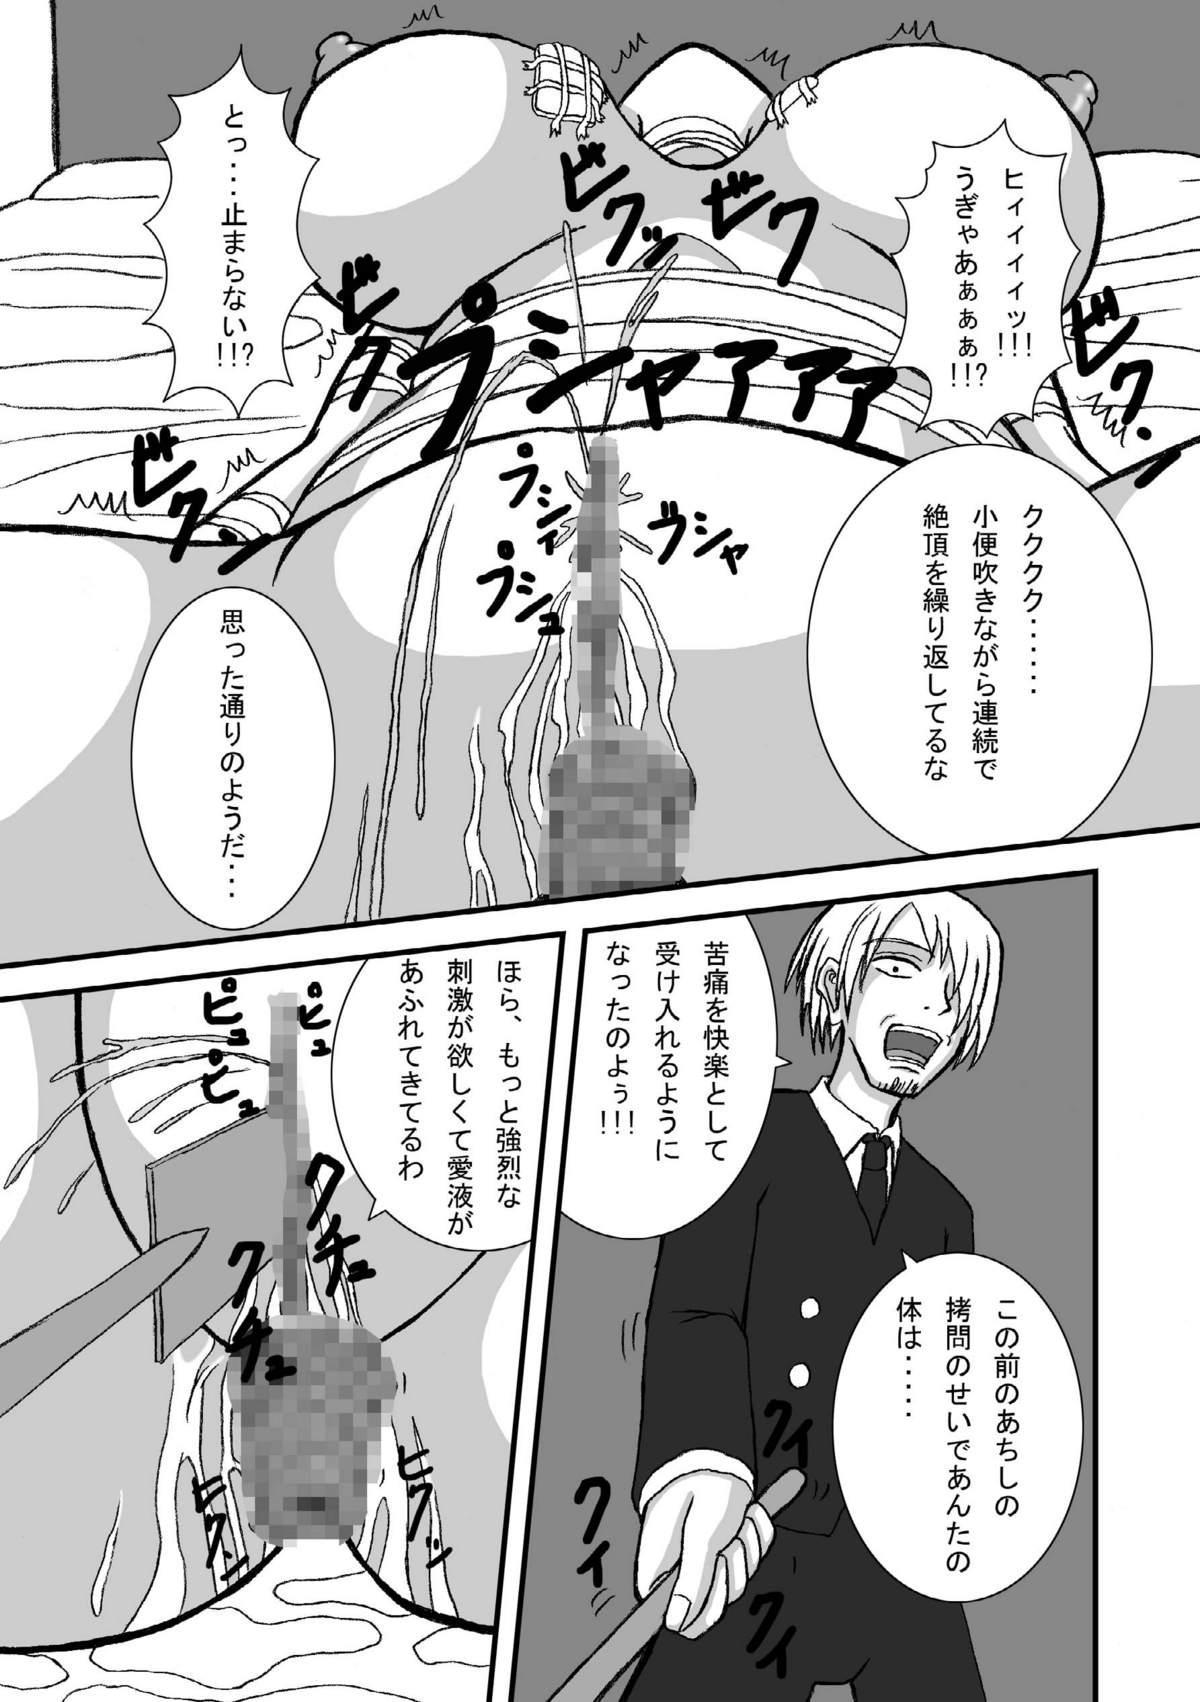 Jump Tales 4 Chou Nami Baku!! Shikyuu Koumon Bakuha Hen 10